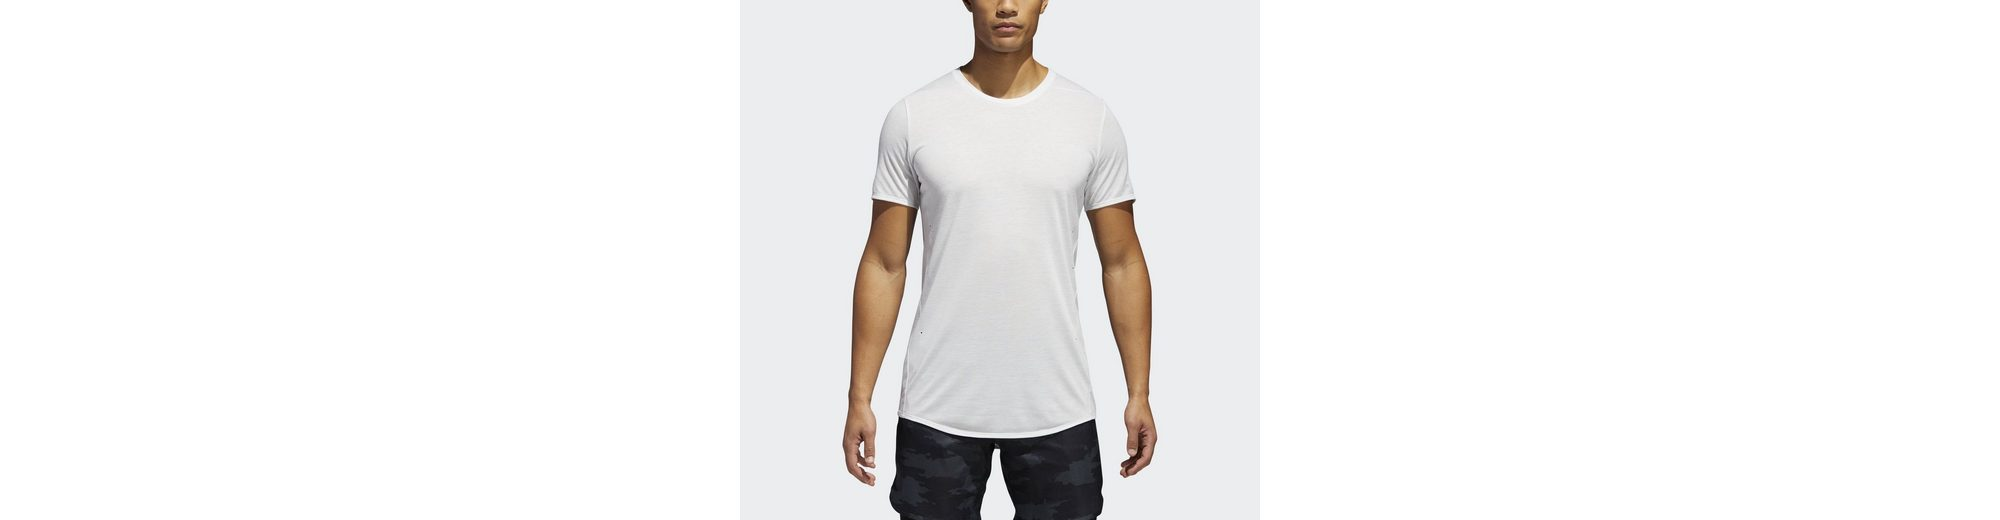 shirt Performance Adidas Pure T Supernova wqan7HC